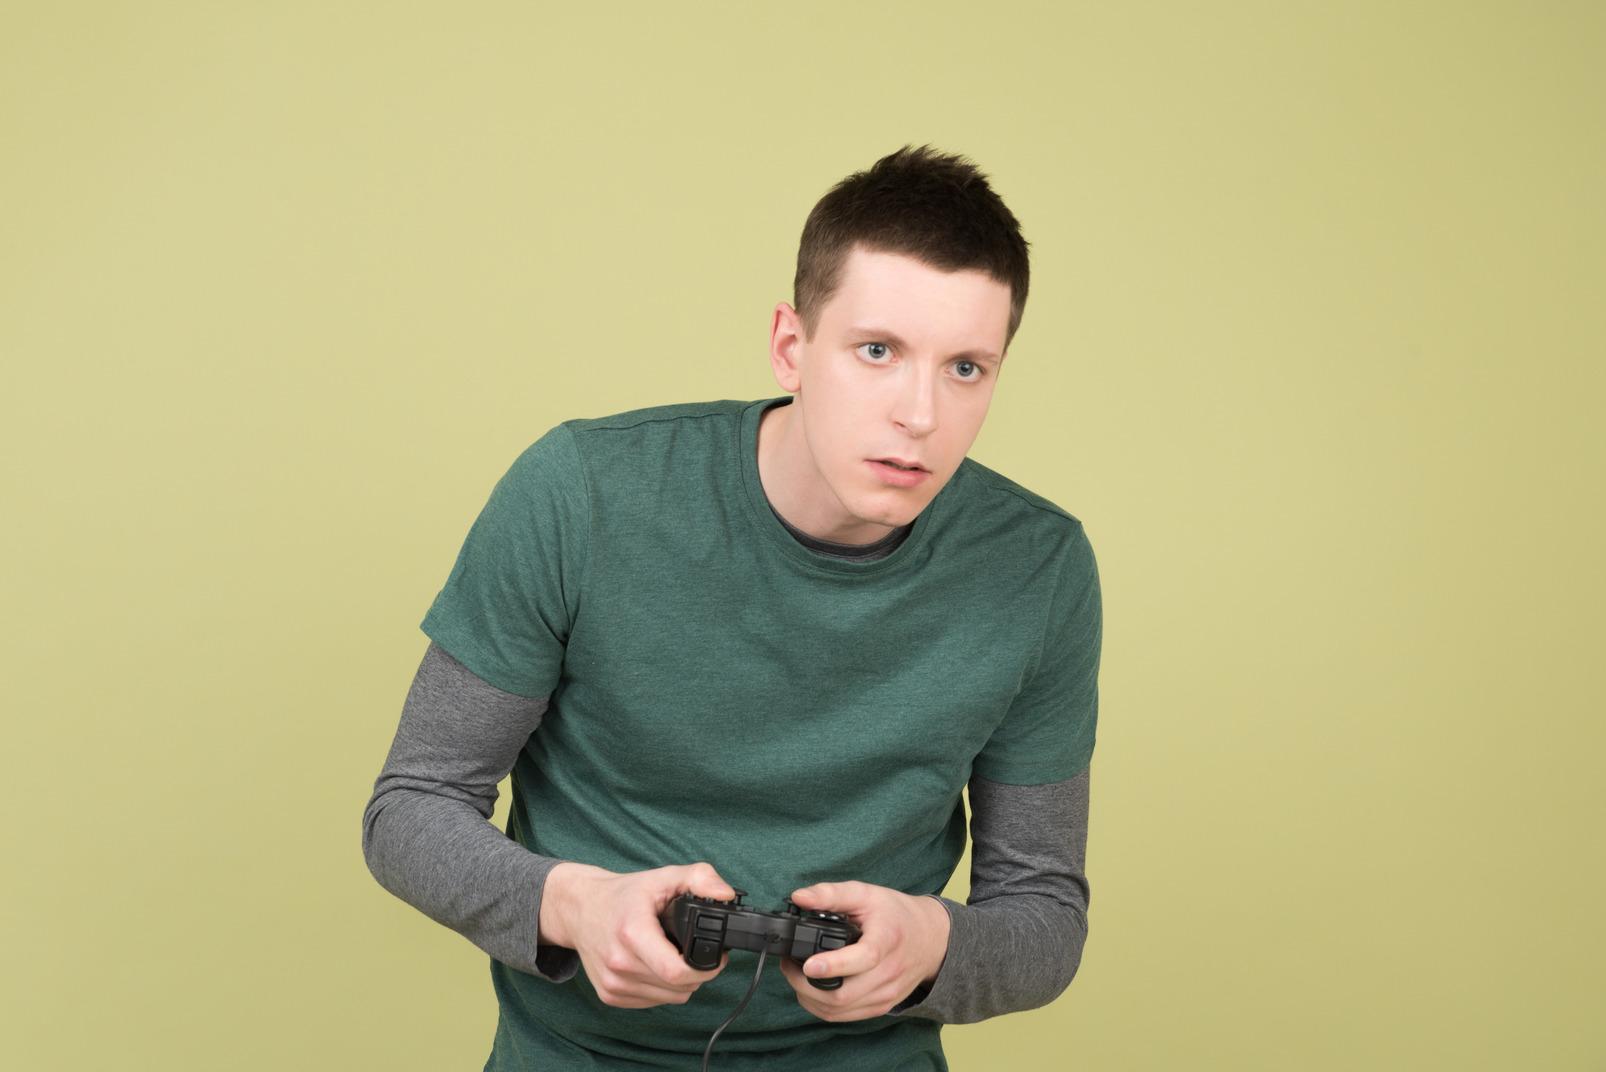 Junger mann, der den gamecontroller spielt videospiele hält